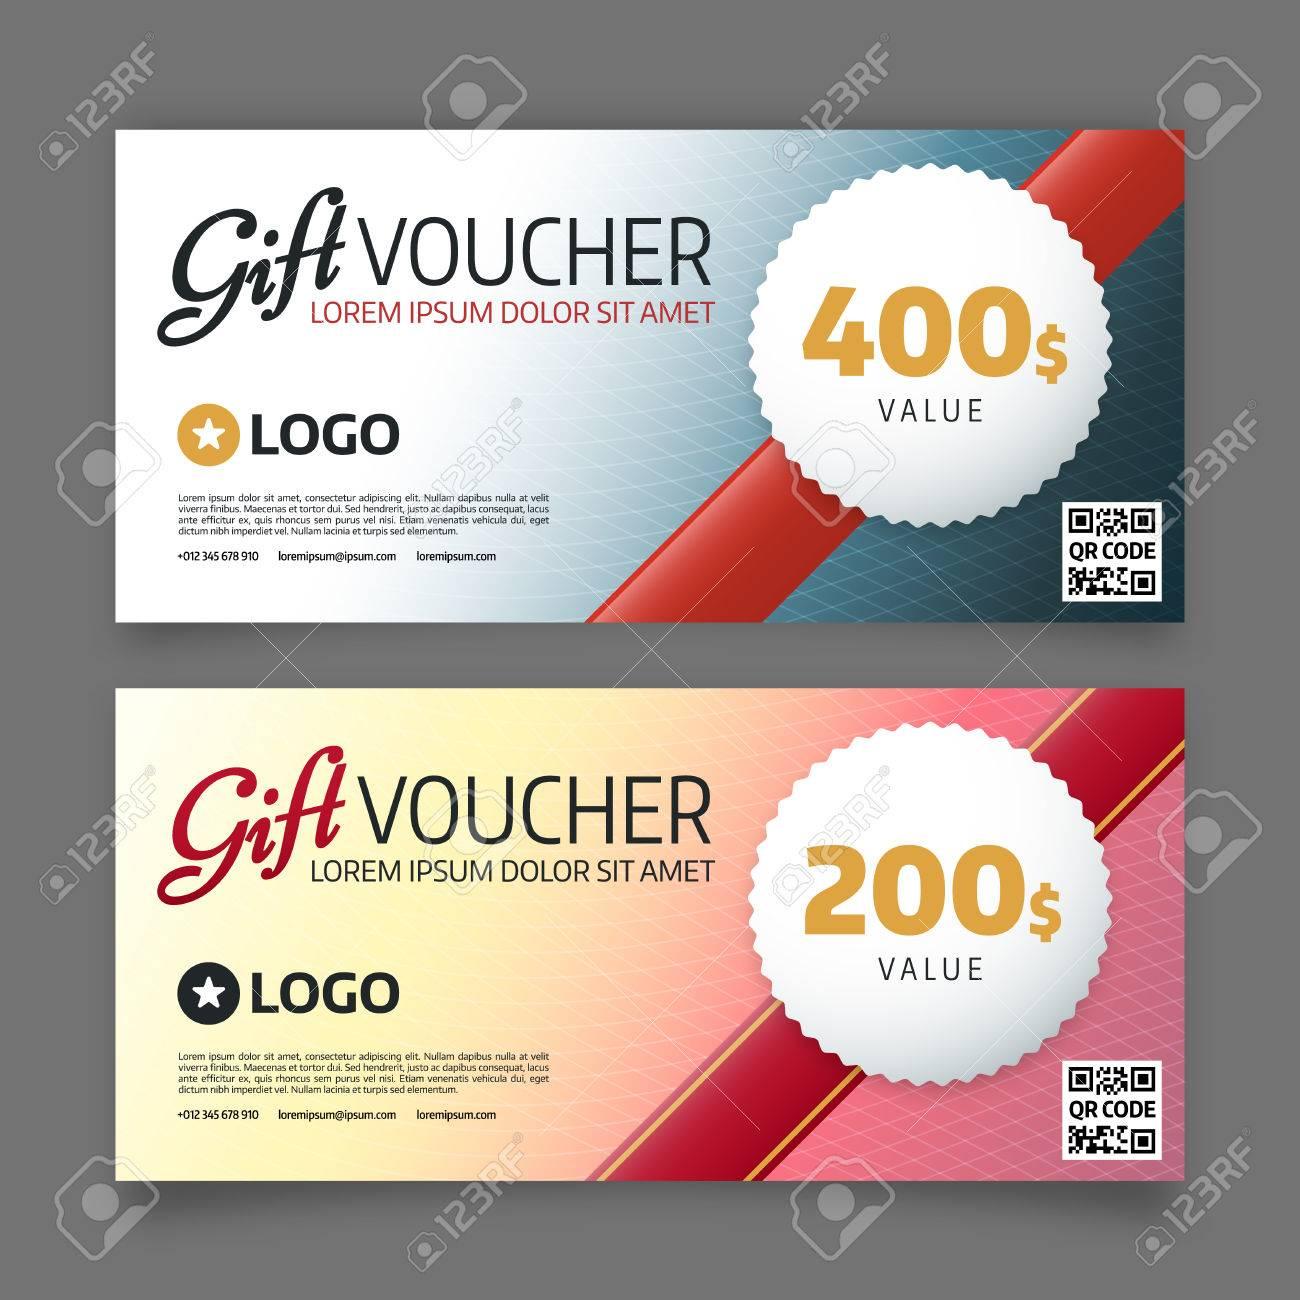 Gift Voucher Template Premium Certificate Coupon Graphic Design